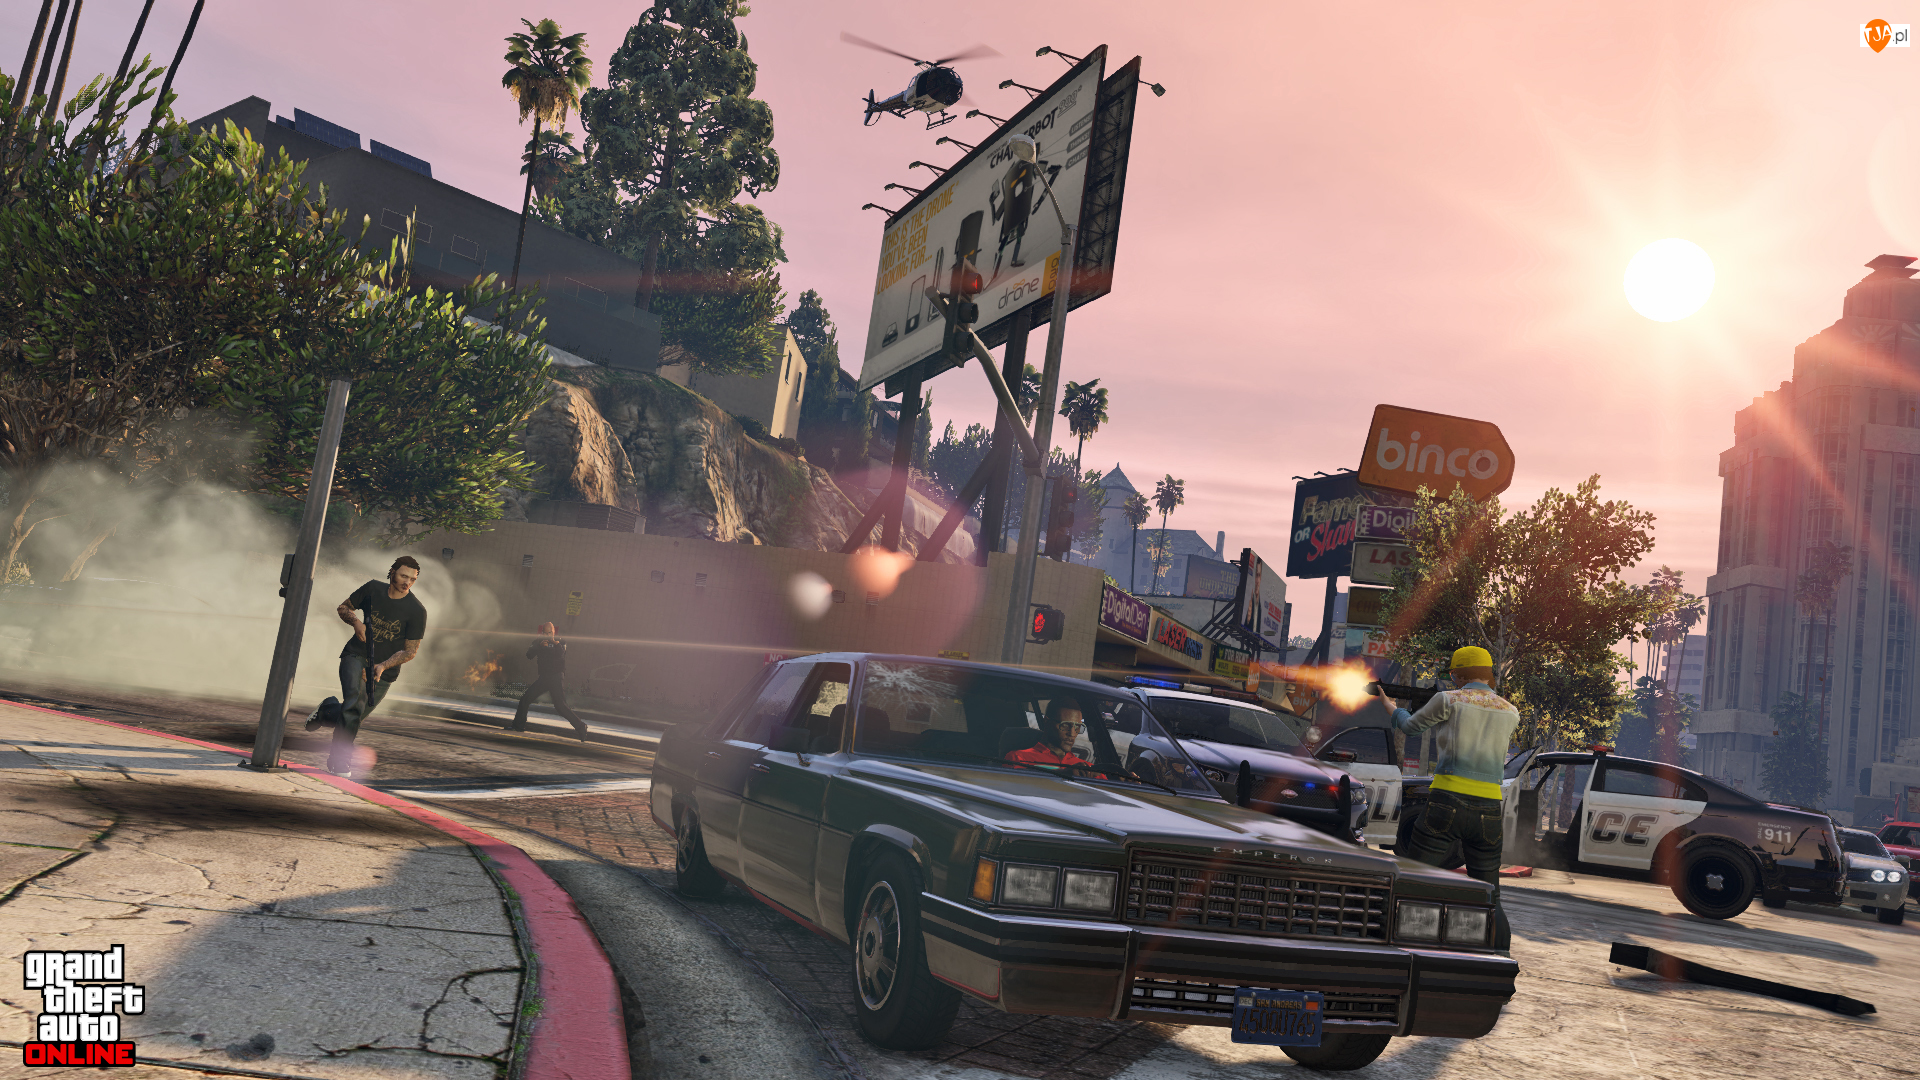 Helikopter, Gra, Maszyna, Grant Theft Auto V, Policja, Strzelanina